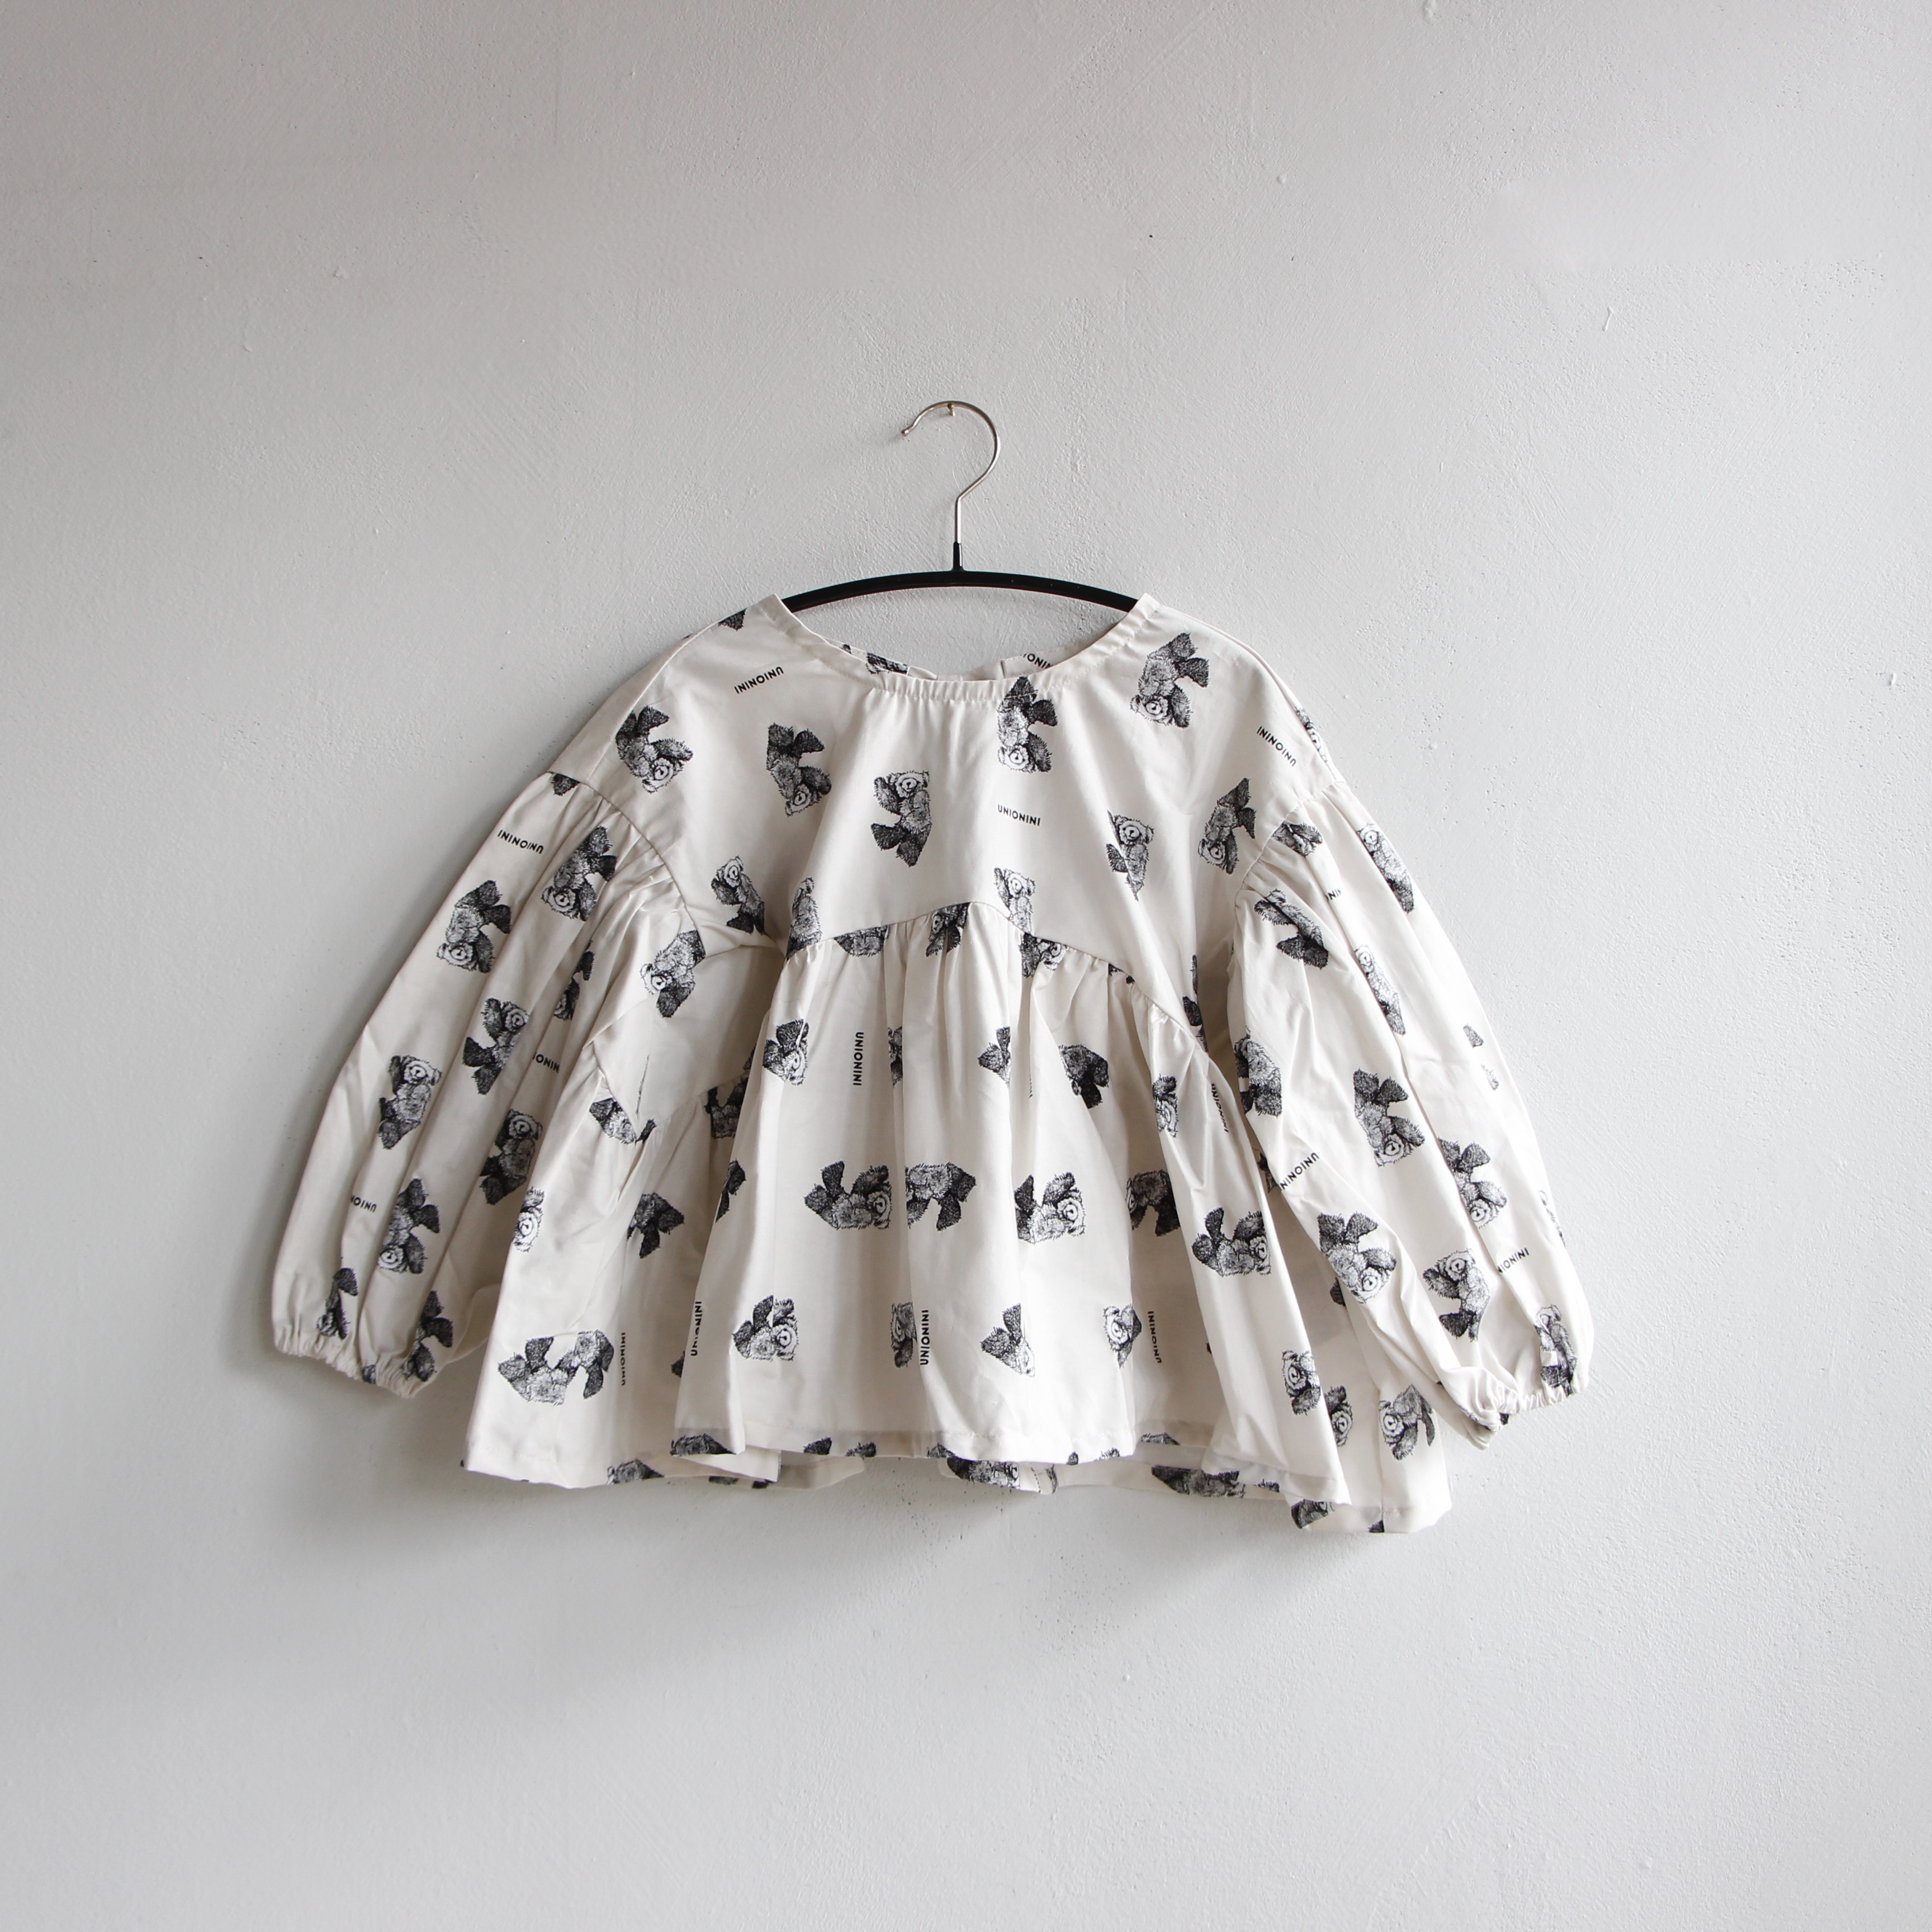 《UNIONINI 2020AW》teddybear blouse / kinari / 2-12Y